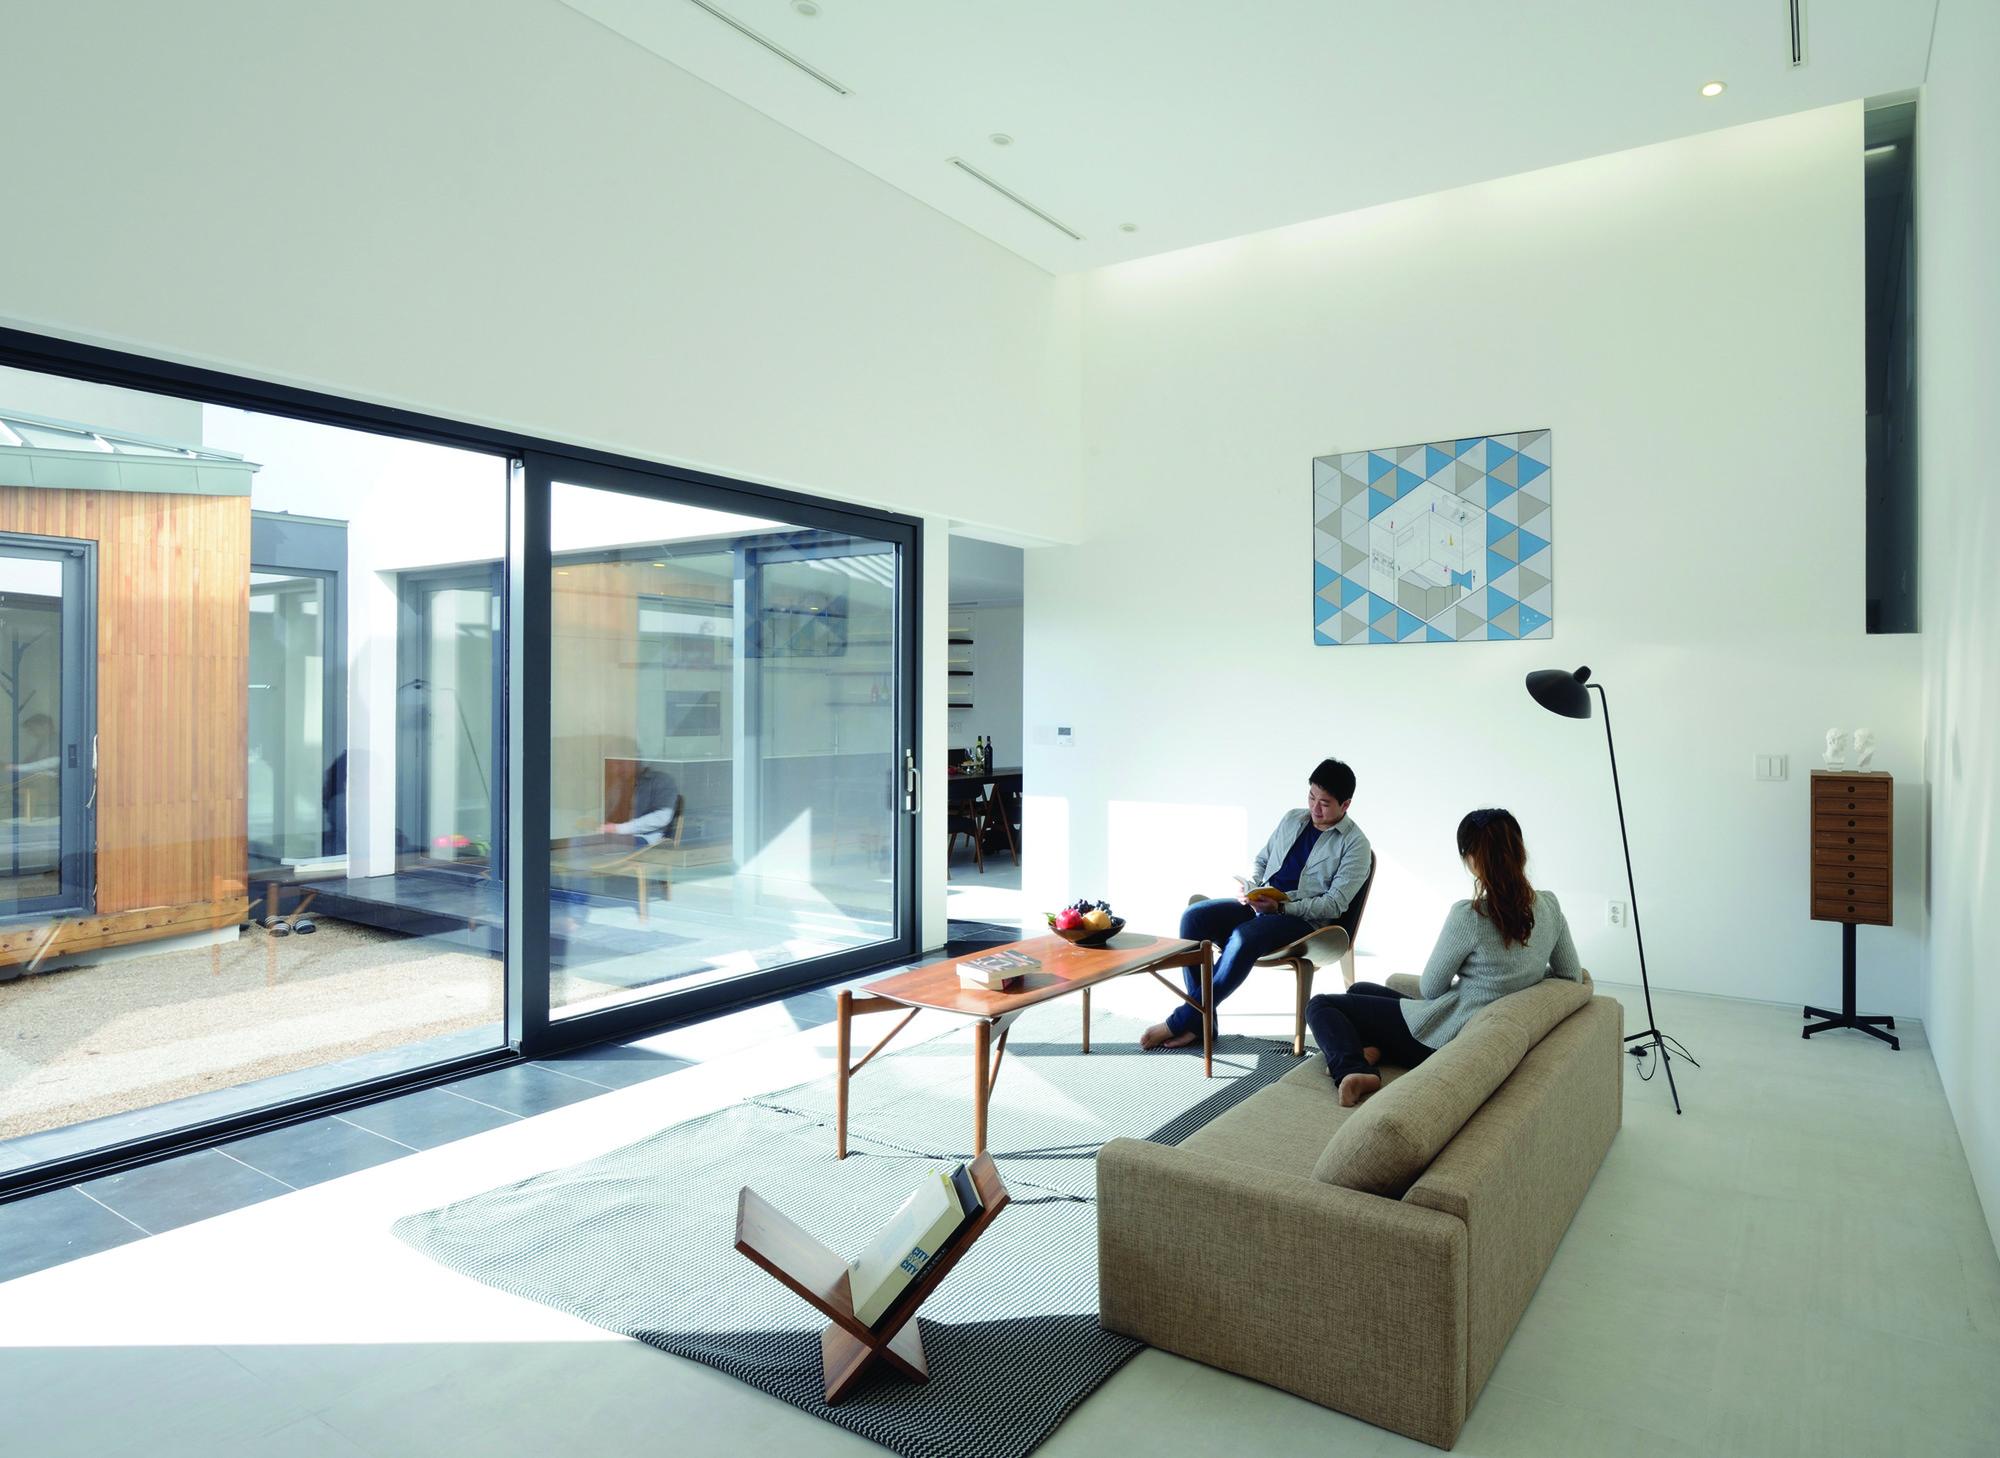 Galer a de casa f cil tru architects 9 - Casa facil picassent ...